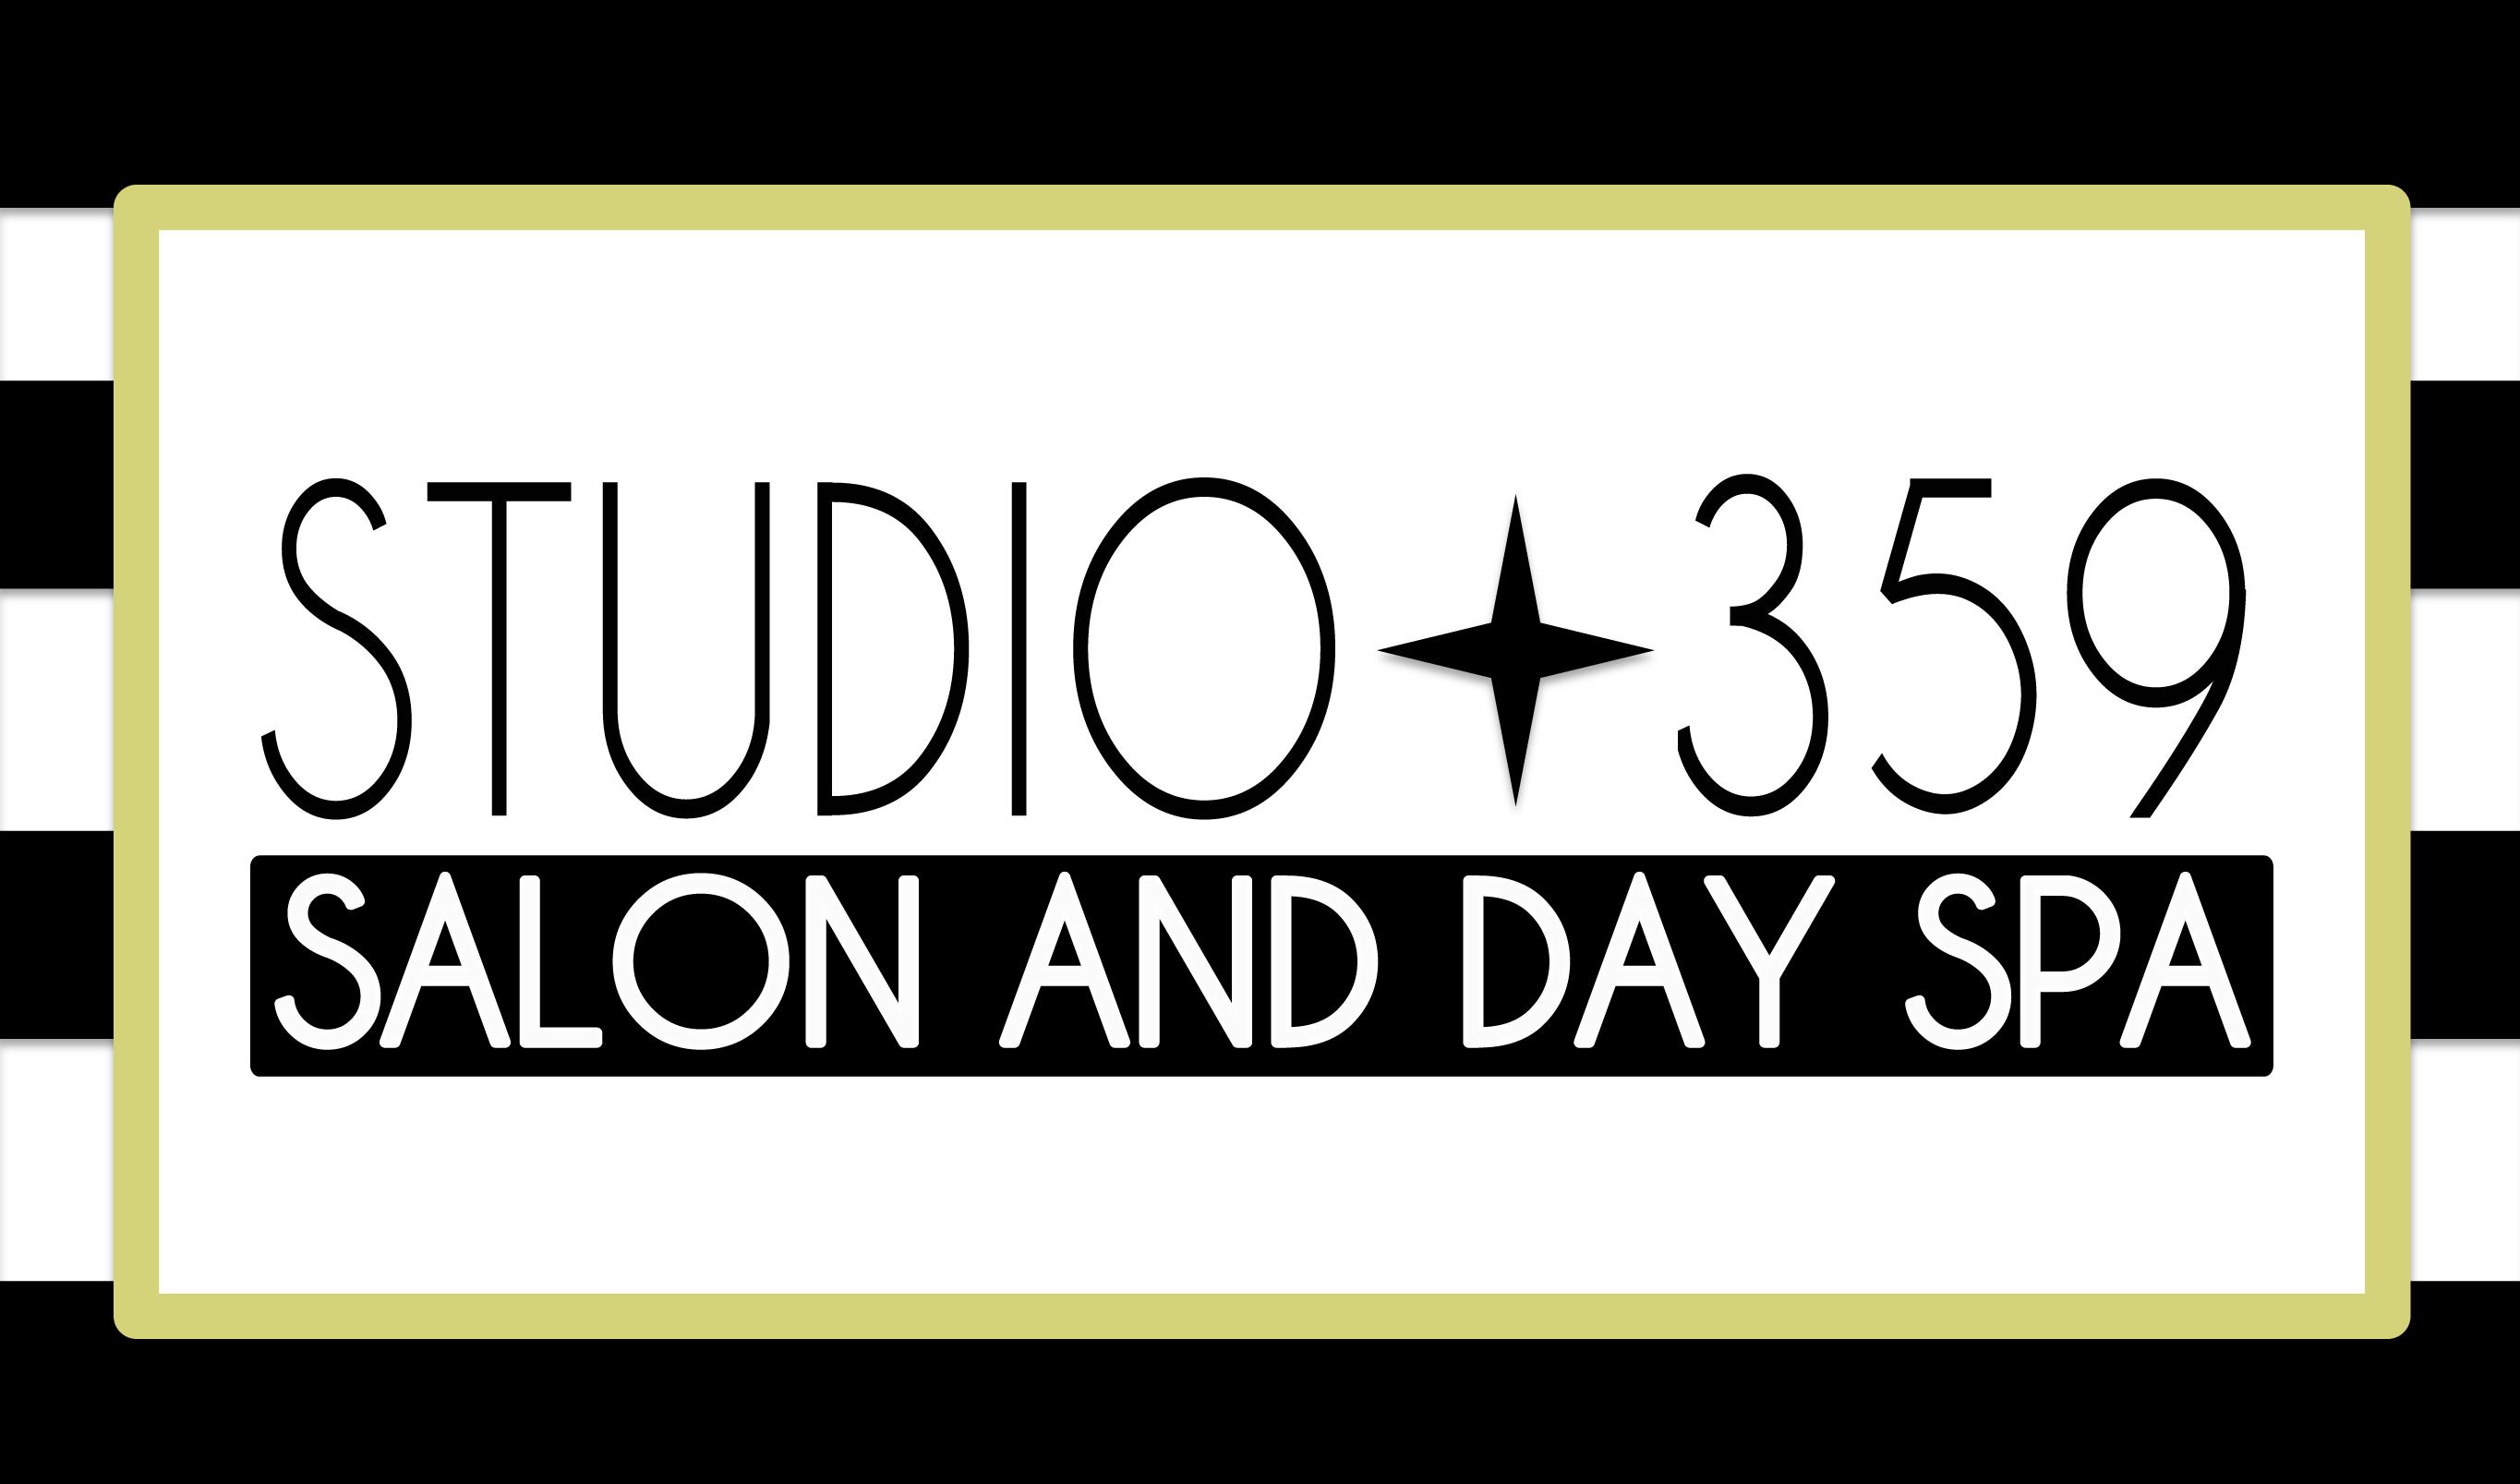 Hair Salon, Nail Salon, and Day Spa in St. George, Utah